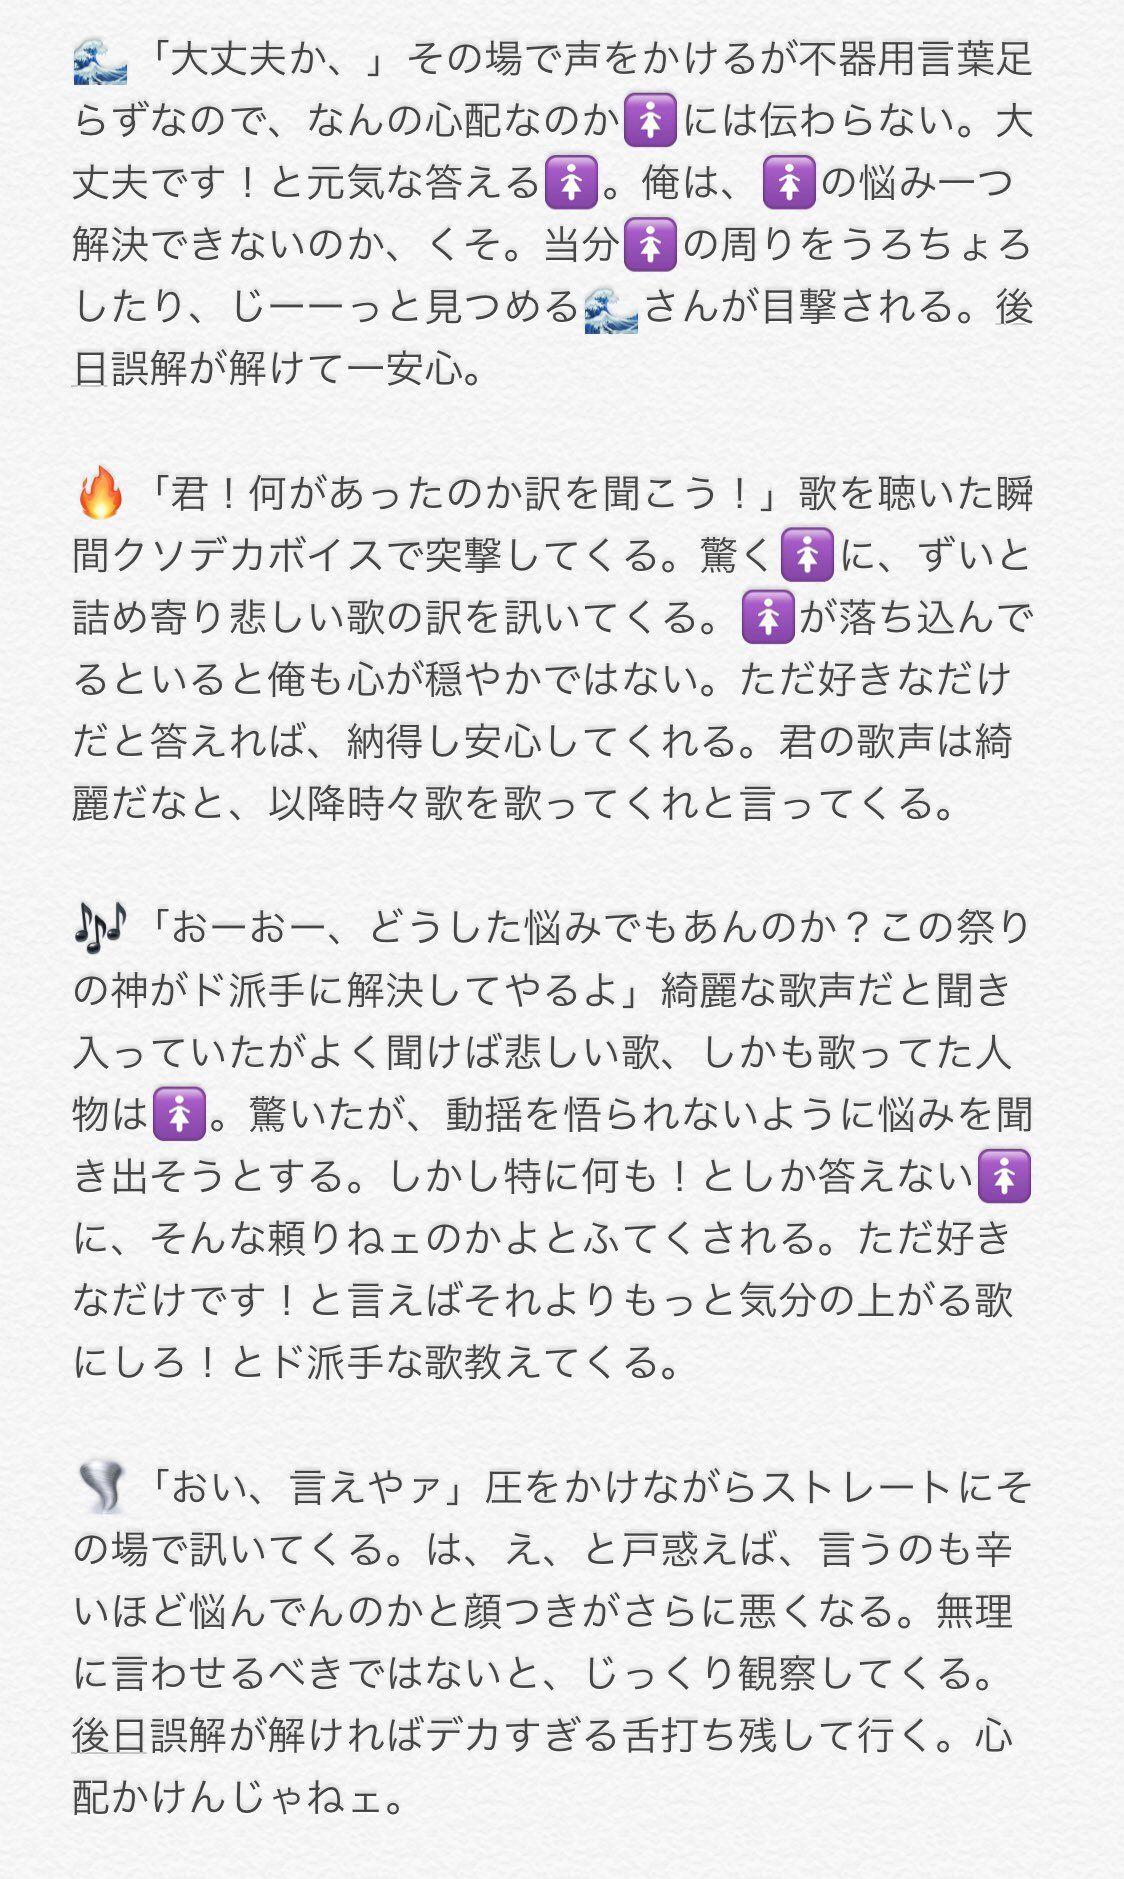 の 刃 小説 夢 鬼 滅